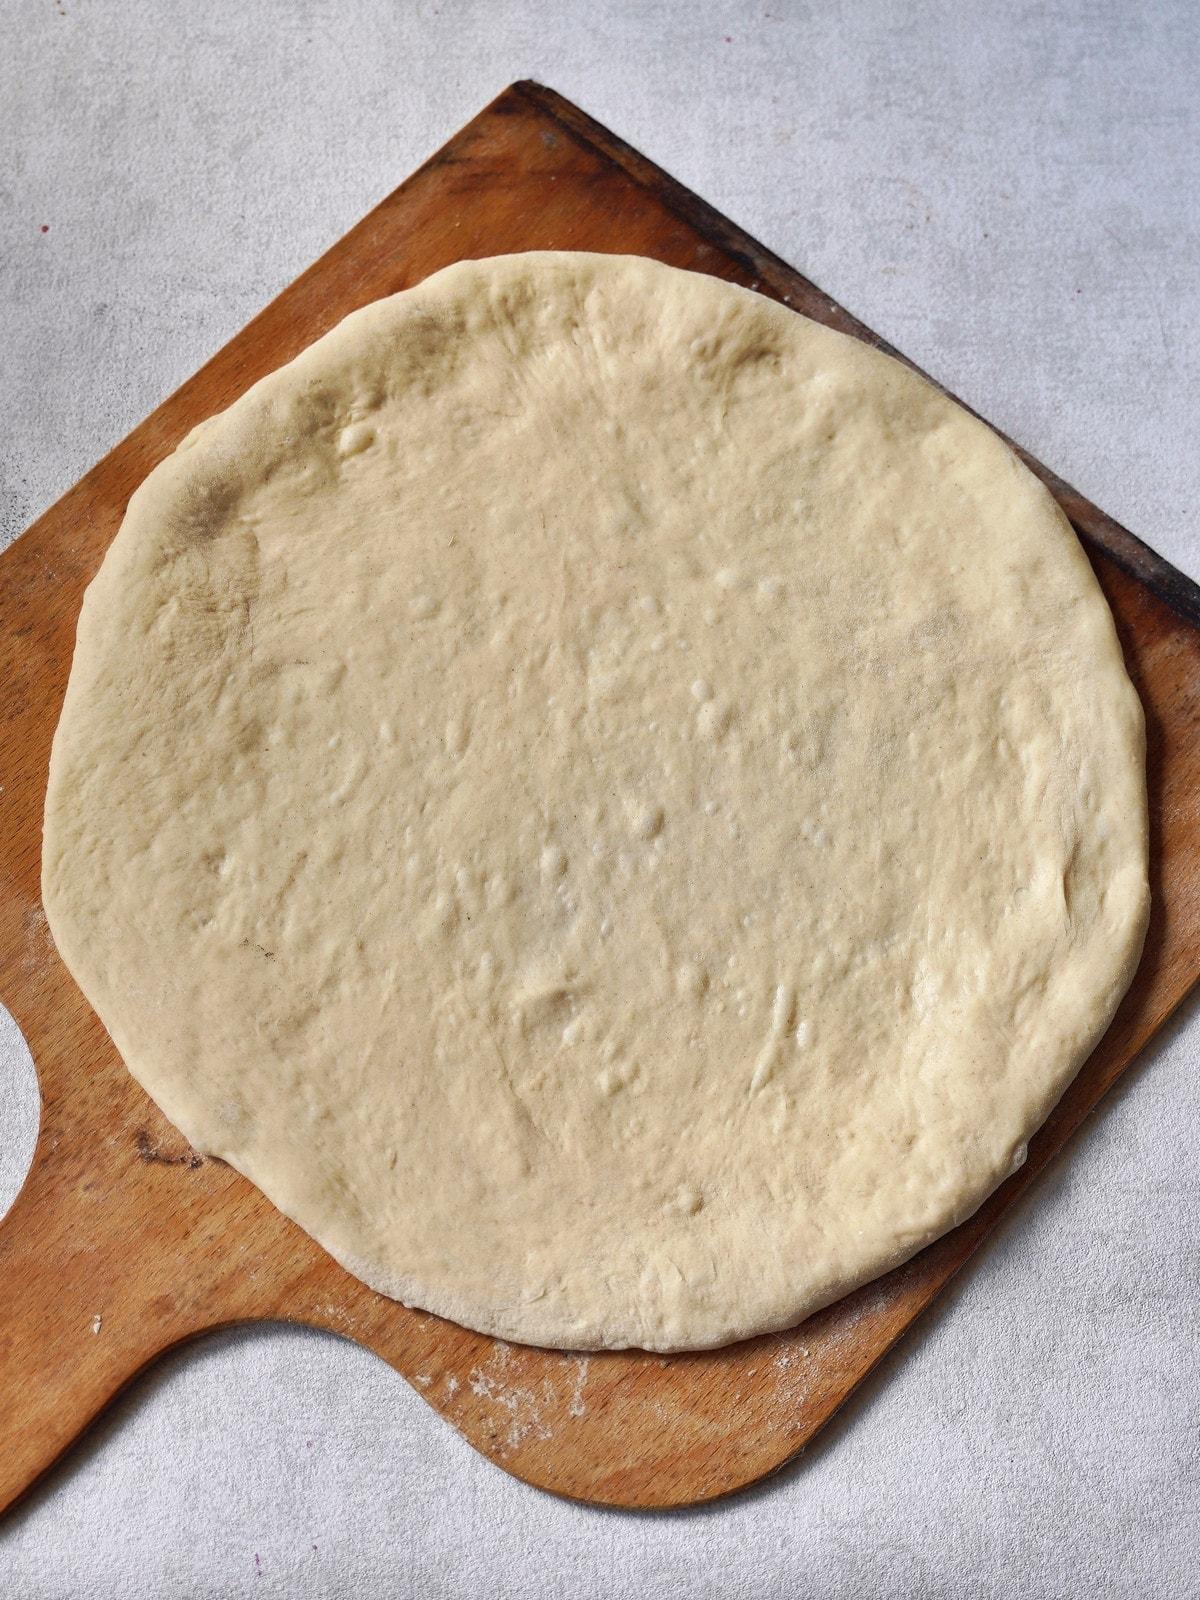 spelt flour pizza dough on wooden board